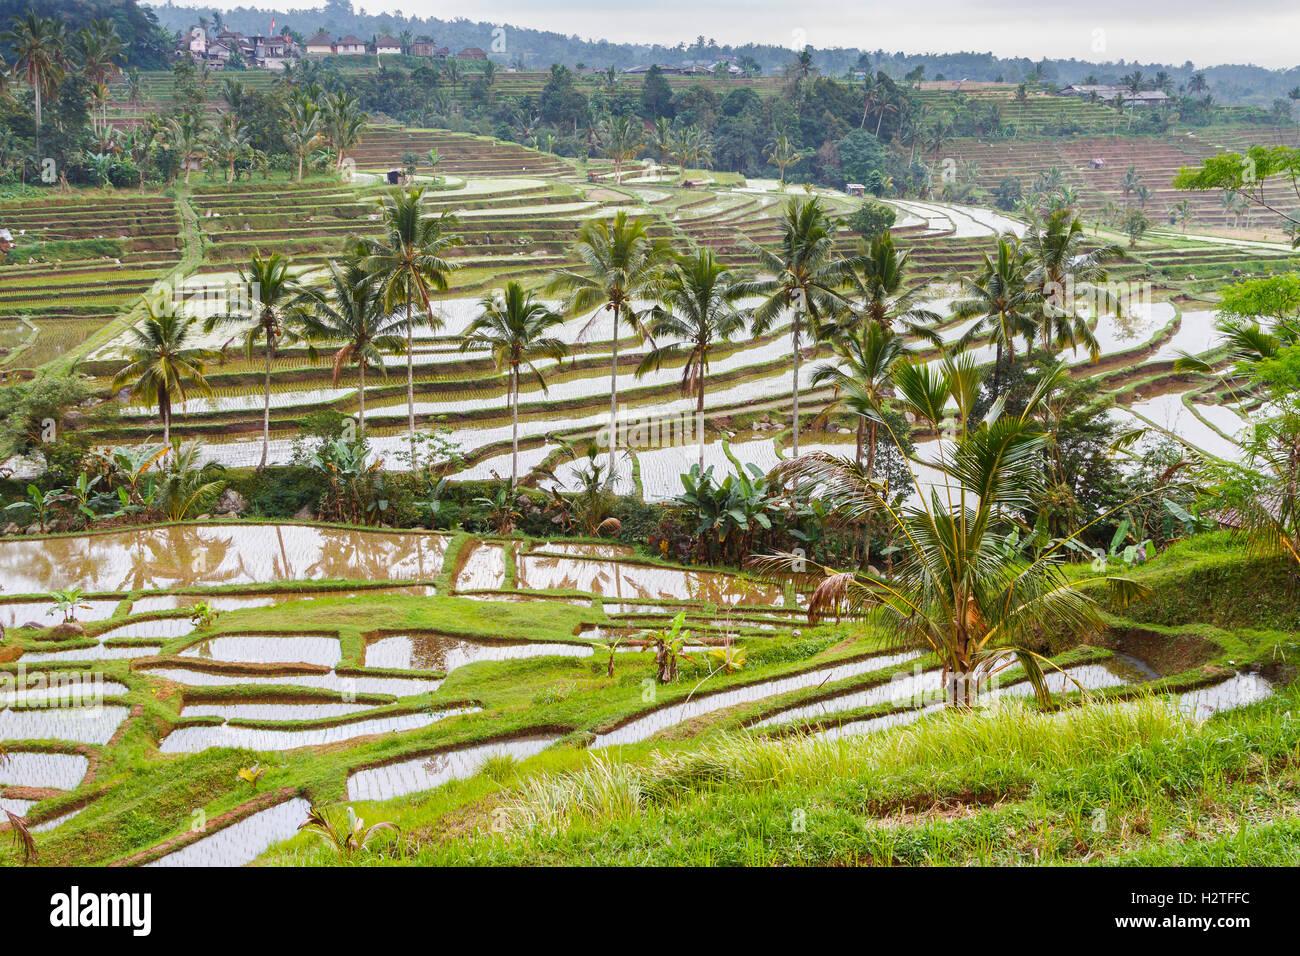 Jatiluwih rice terraces. Bali. Indonesia, Asia. - Stock Image